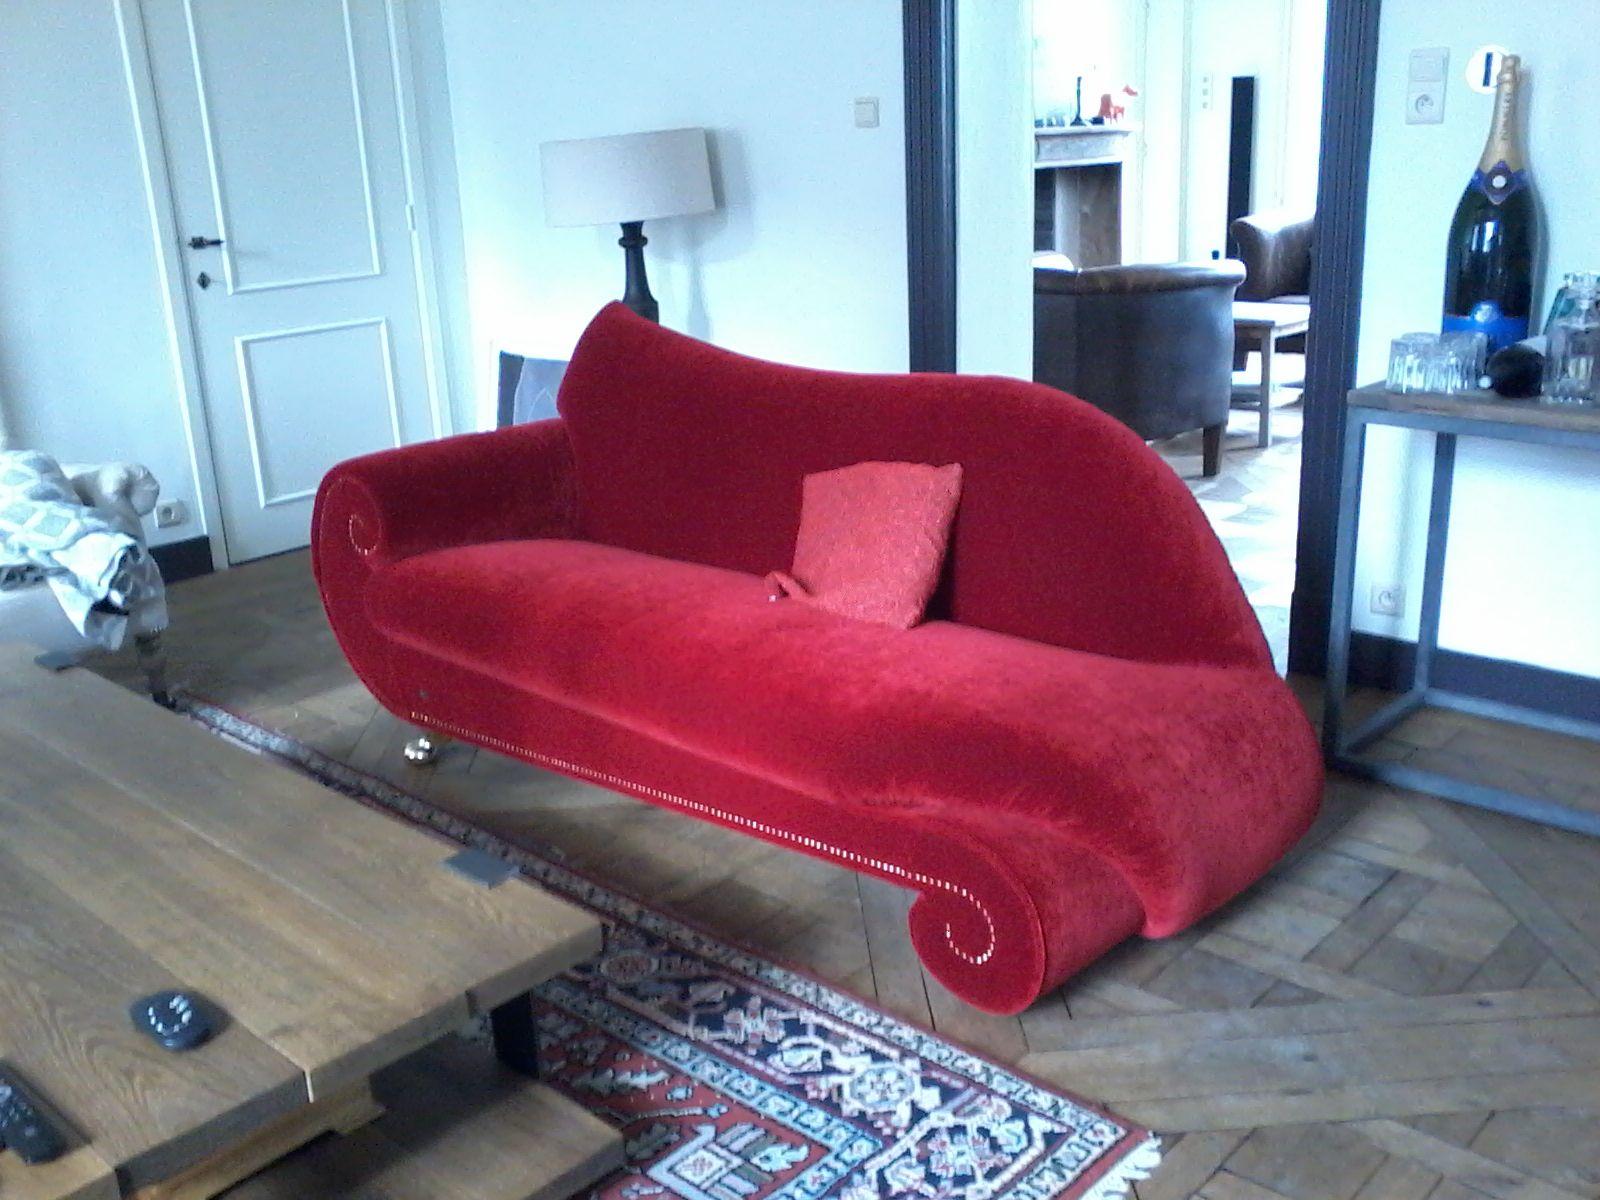 Bretz Gaudi Recamiere In Opera Red By Zetelboetiek Bretz Belgium Furniture Chaise Lounge Home Decor